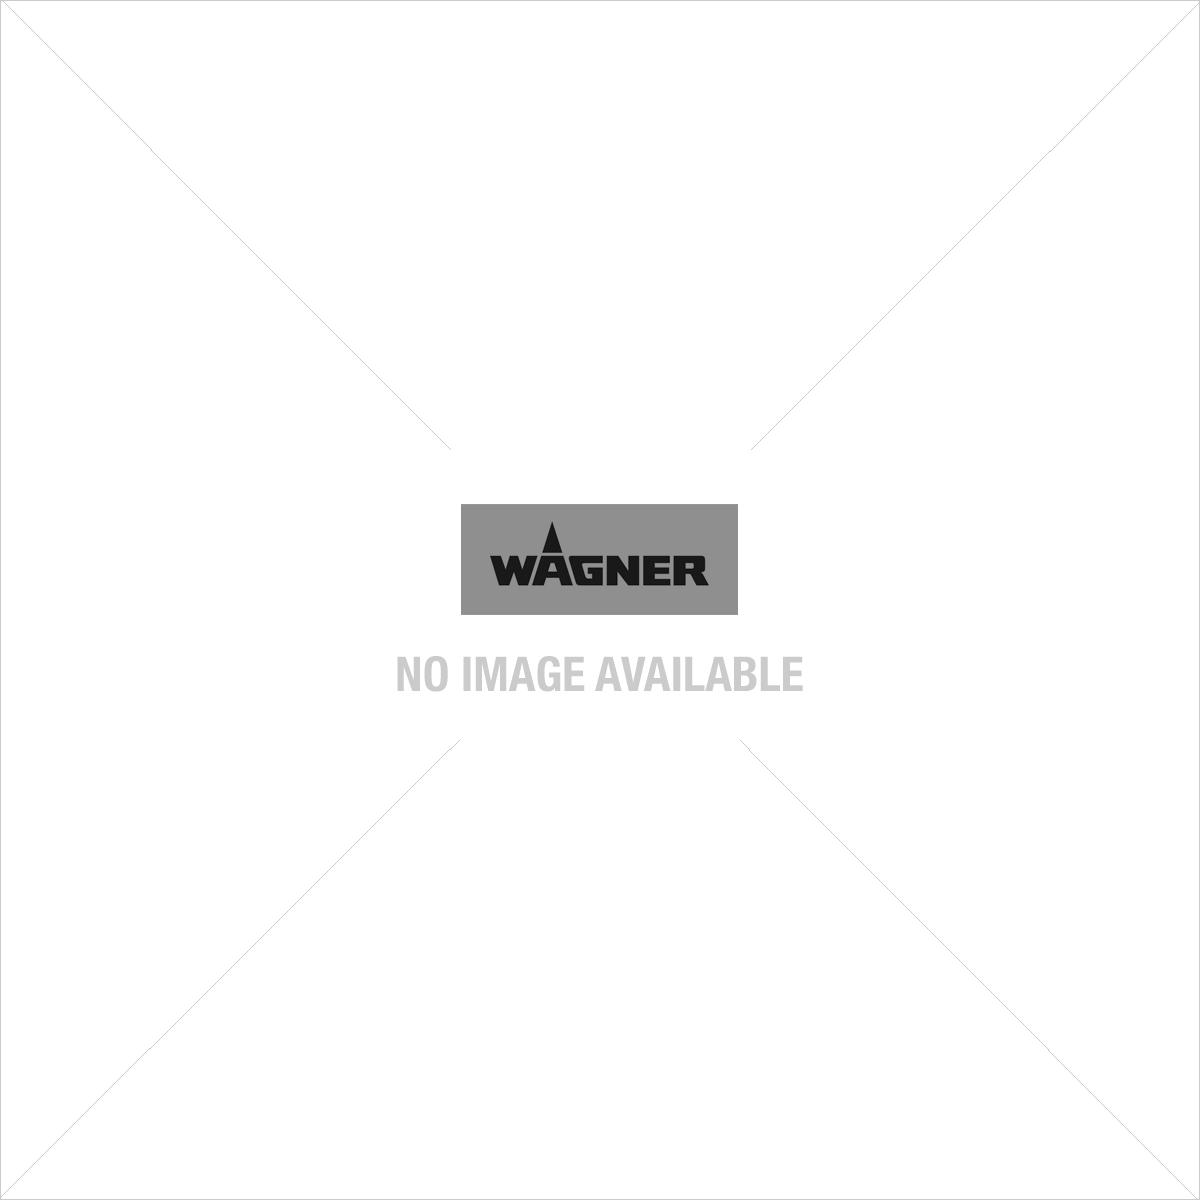 Wagner Airless Sprayer Plus Paint Sprayer. Order online now.